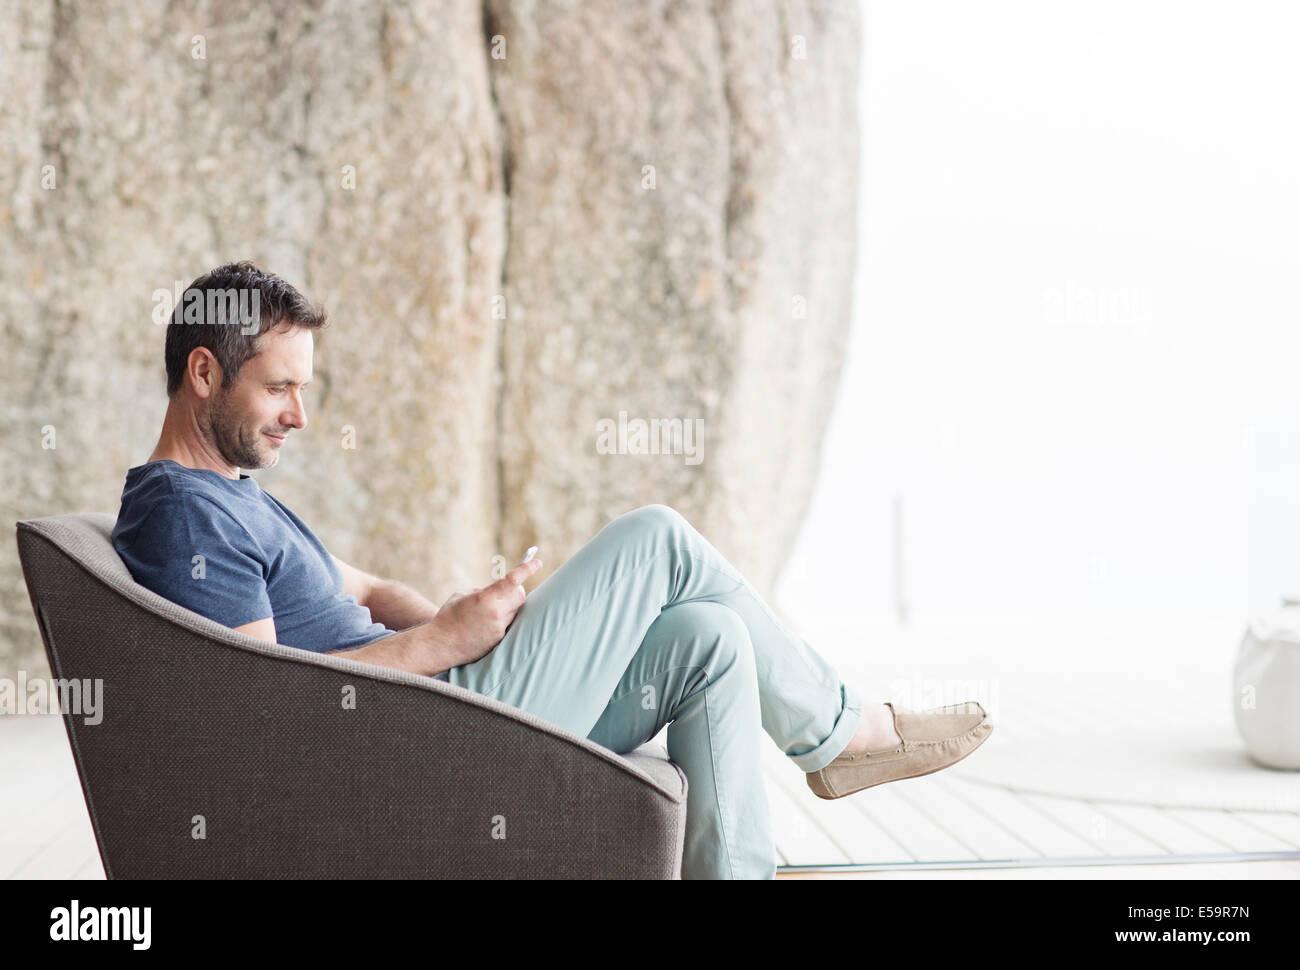 Hombre sentado en el sillón moderno Imagen De Stock